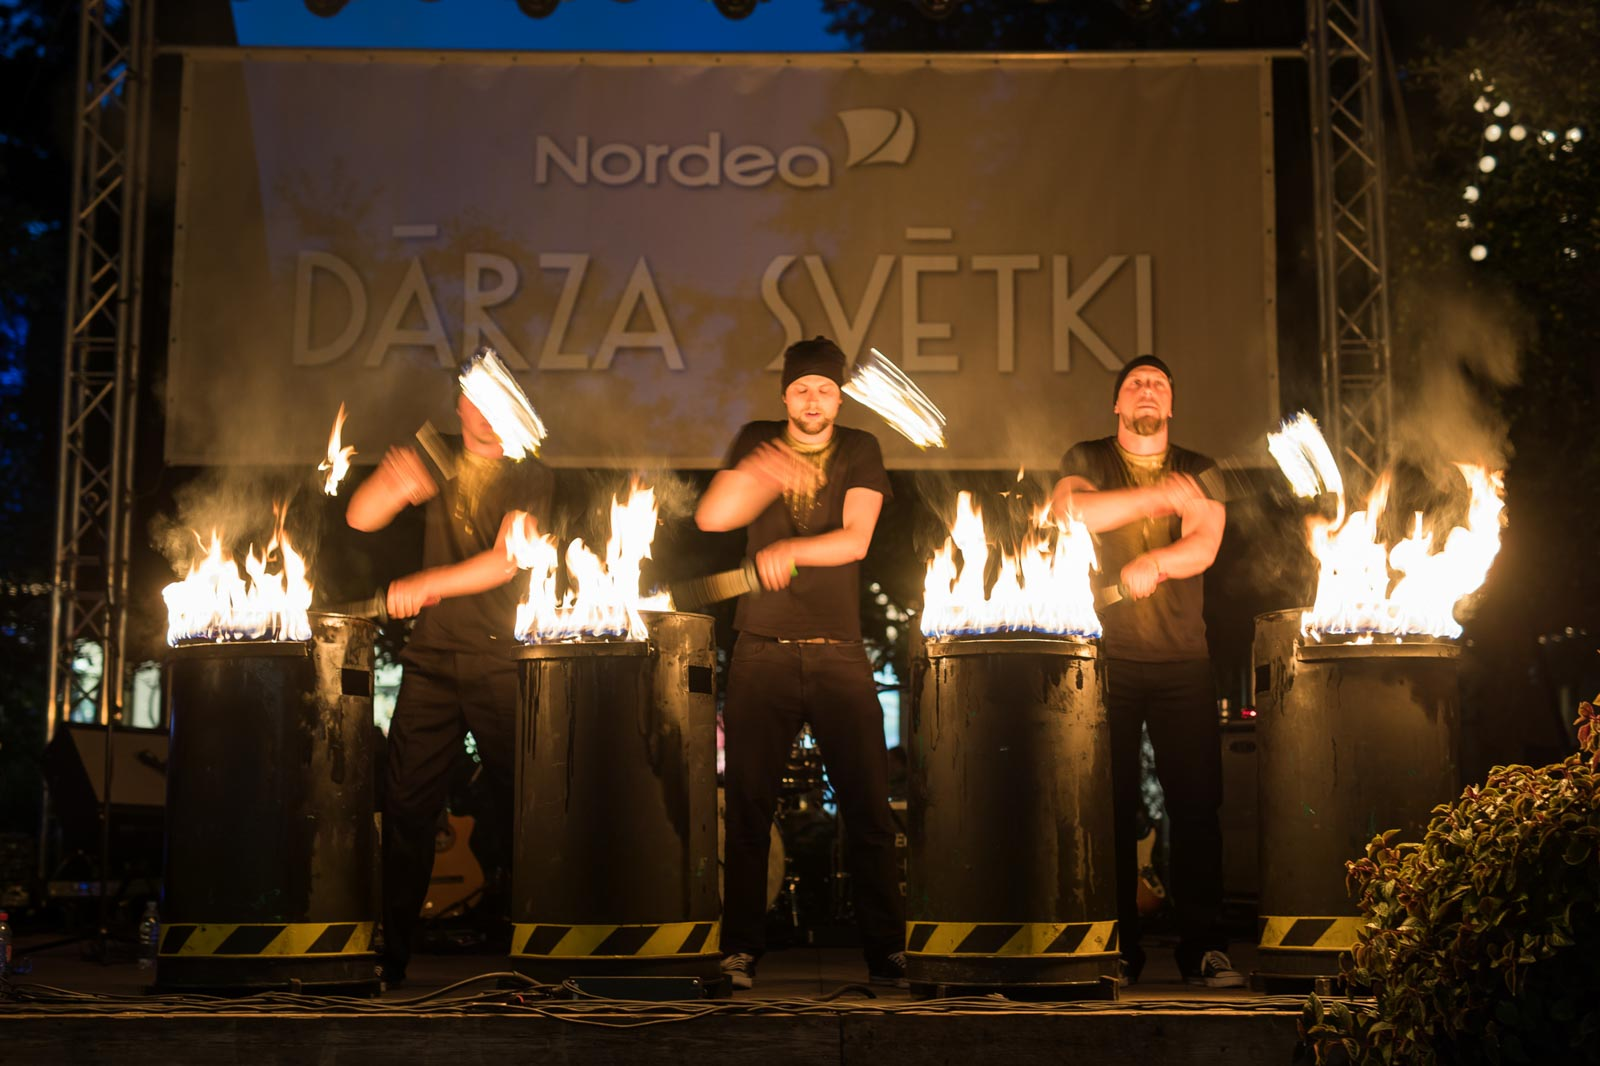 Nordea_DarzaSvetki_s-484